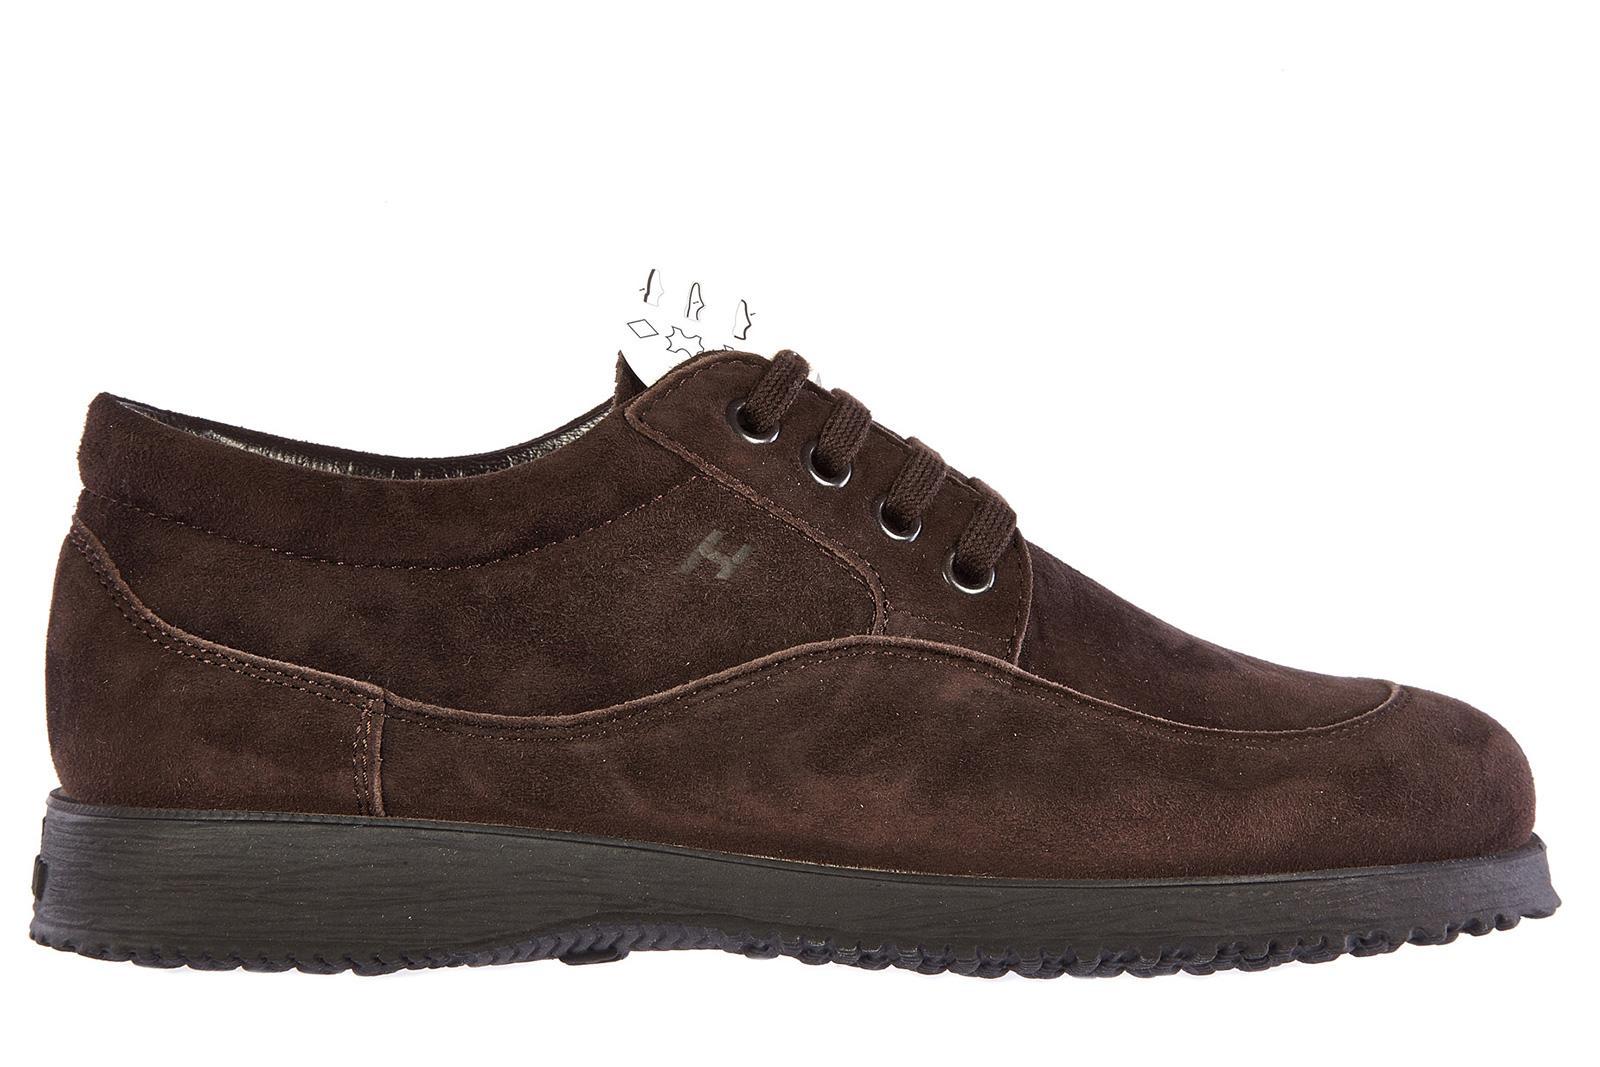 Hogan Damenschuhe Turnschuhe Damen Wildleder Schuhe Sneakers Traditional In Brown